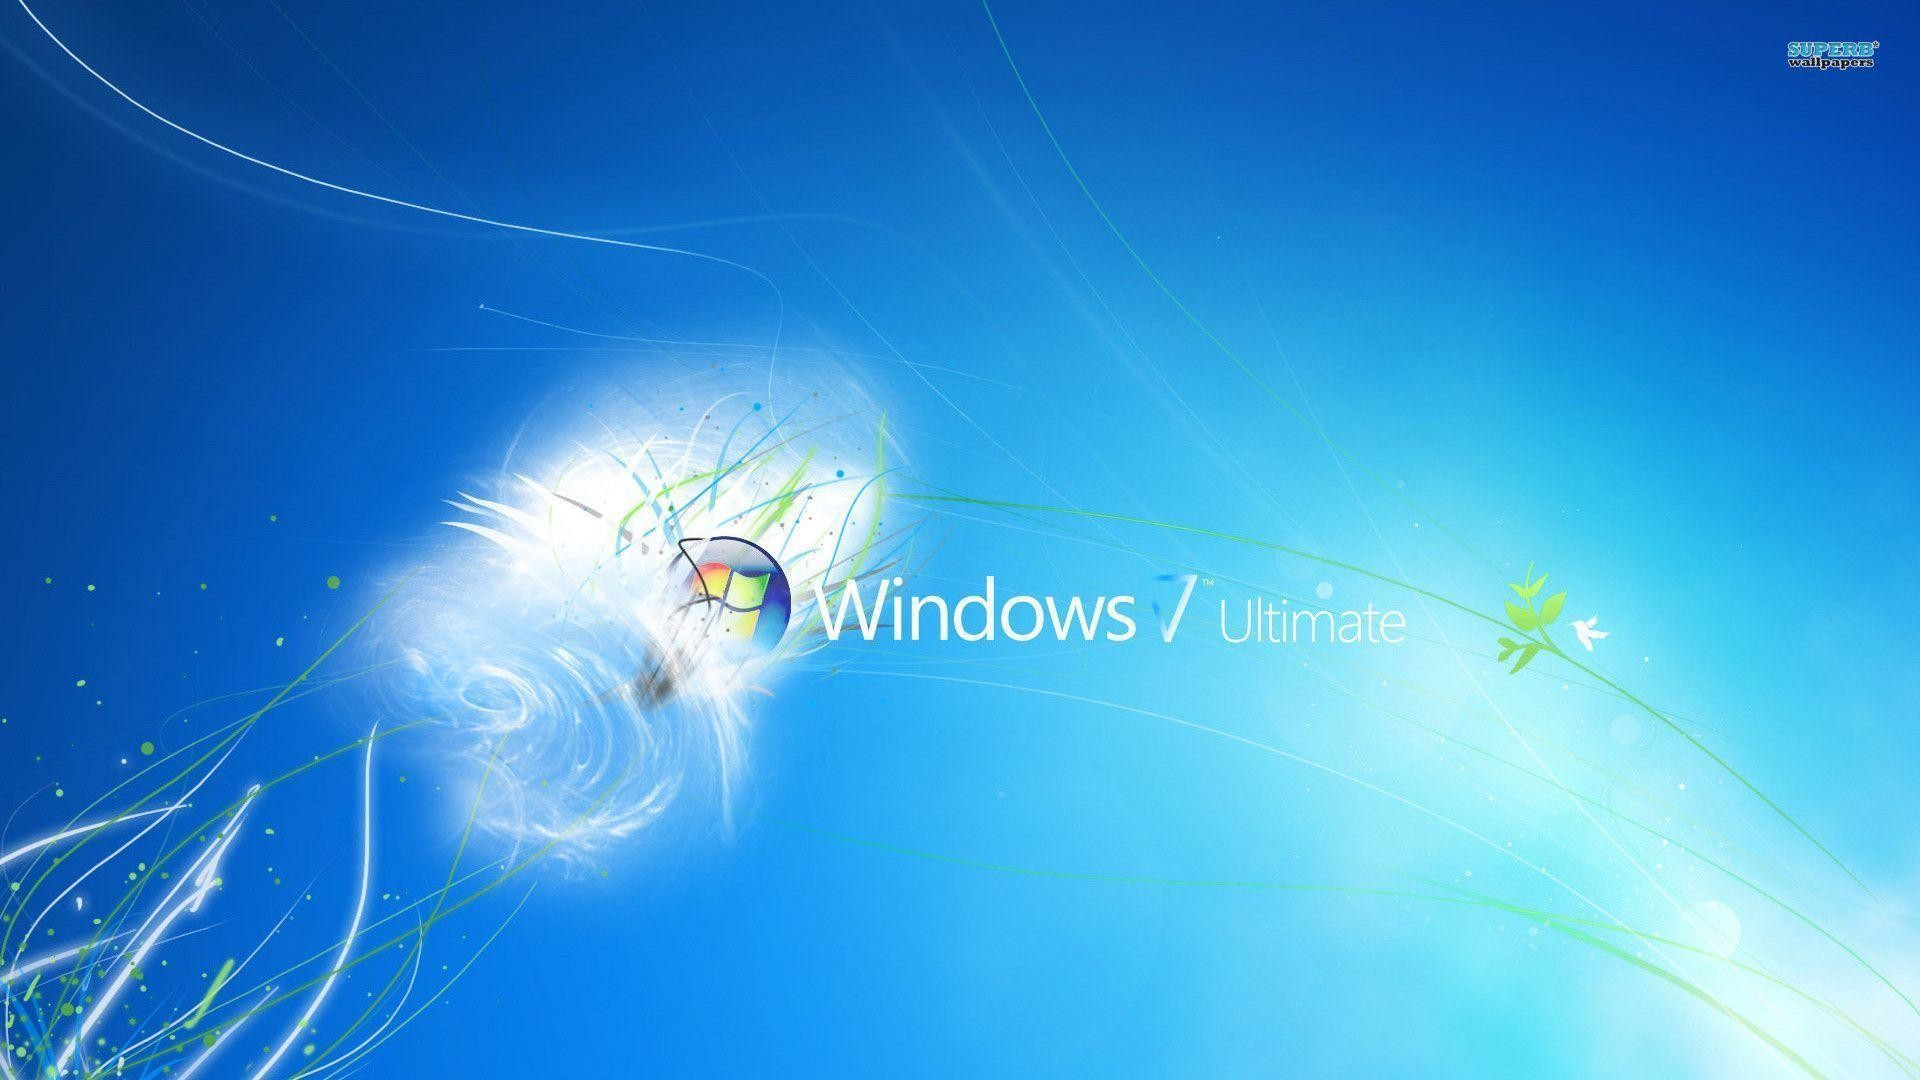 windows 98 wallpaper 1920x1080